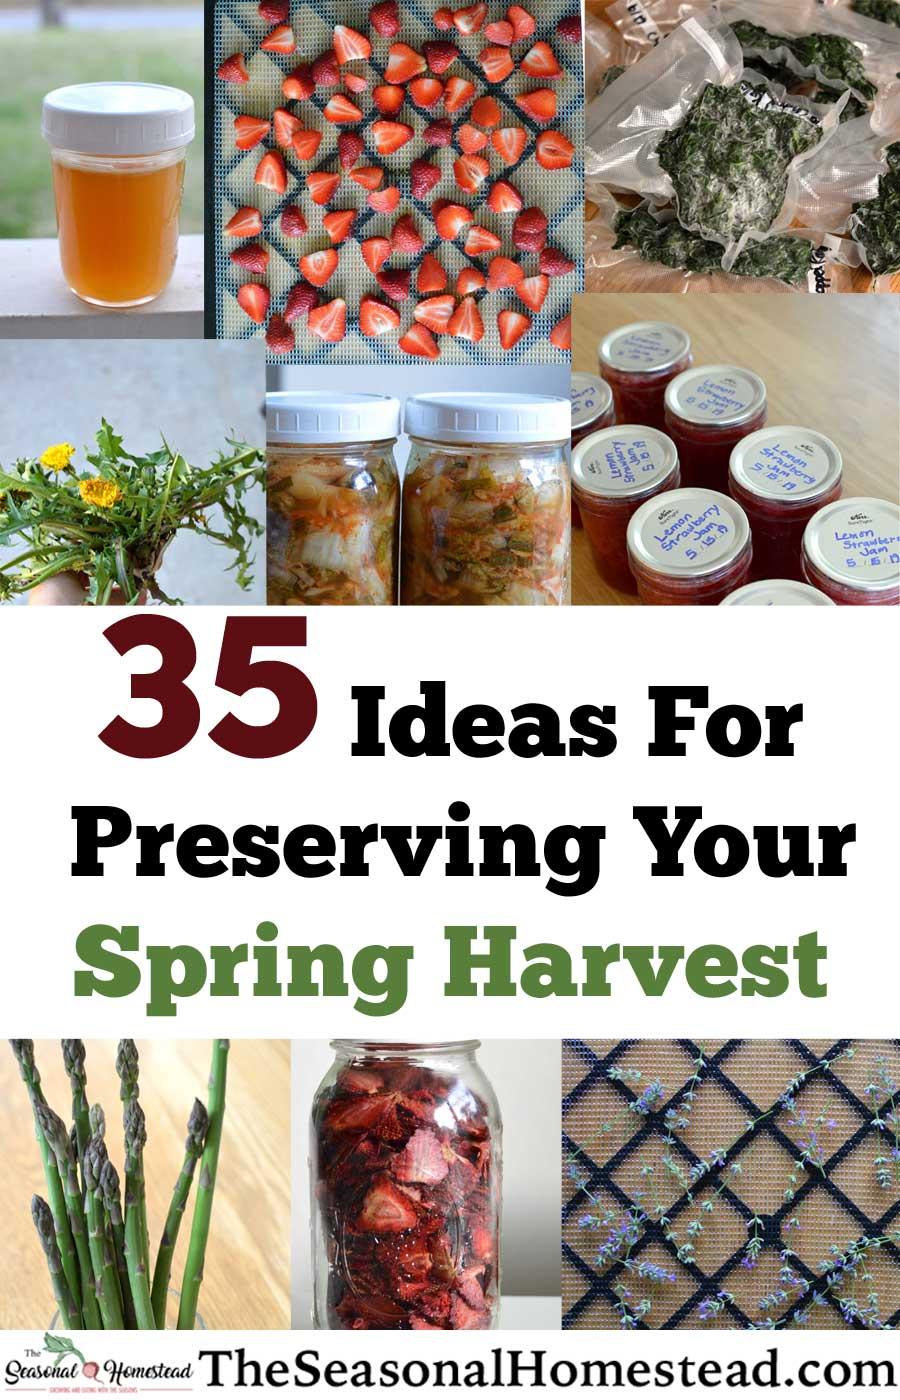 35-Ideas-for-Preserving-Your-Spring-Harvest.jpg